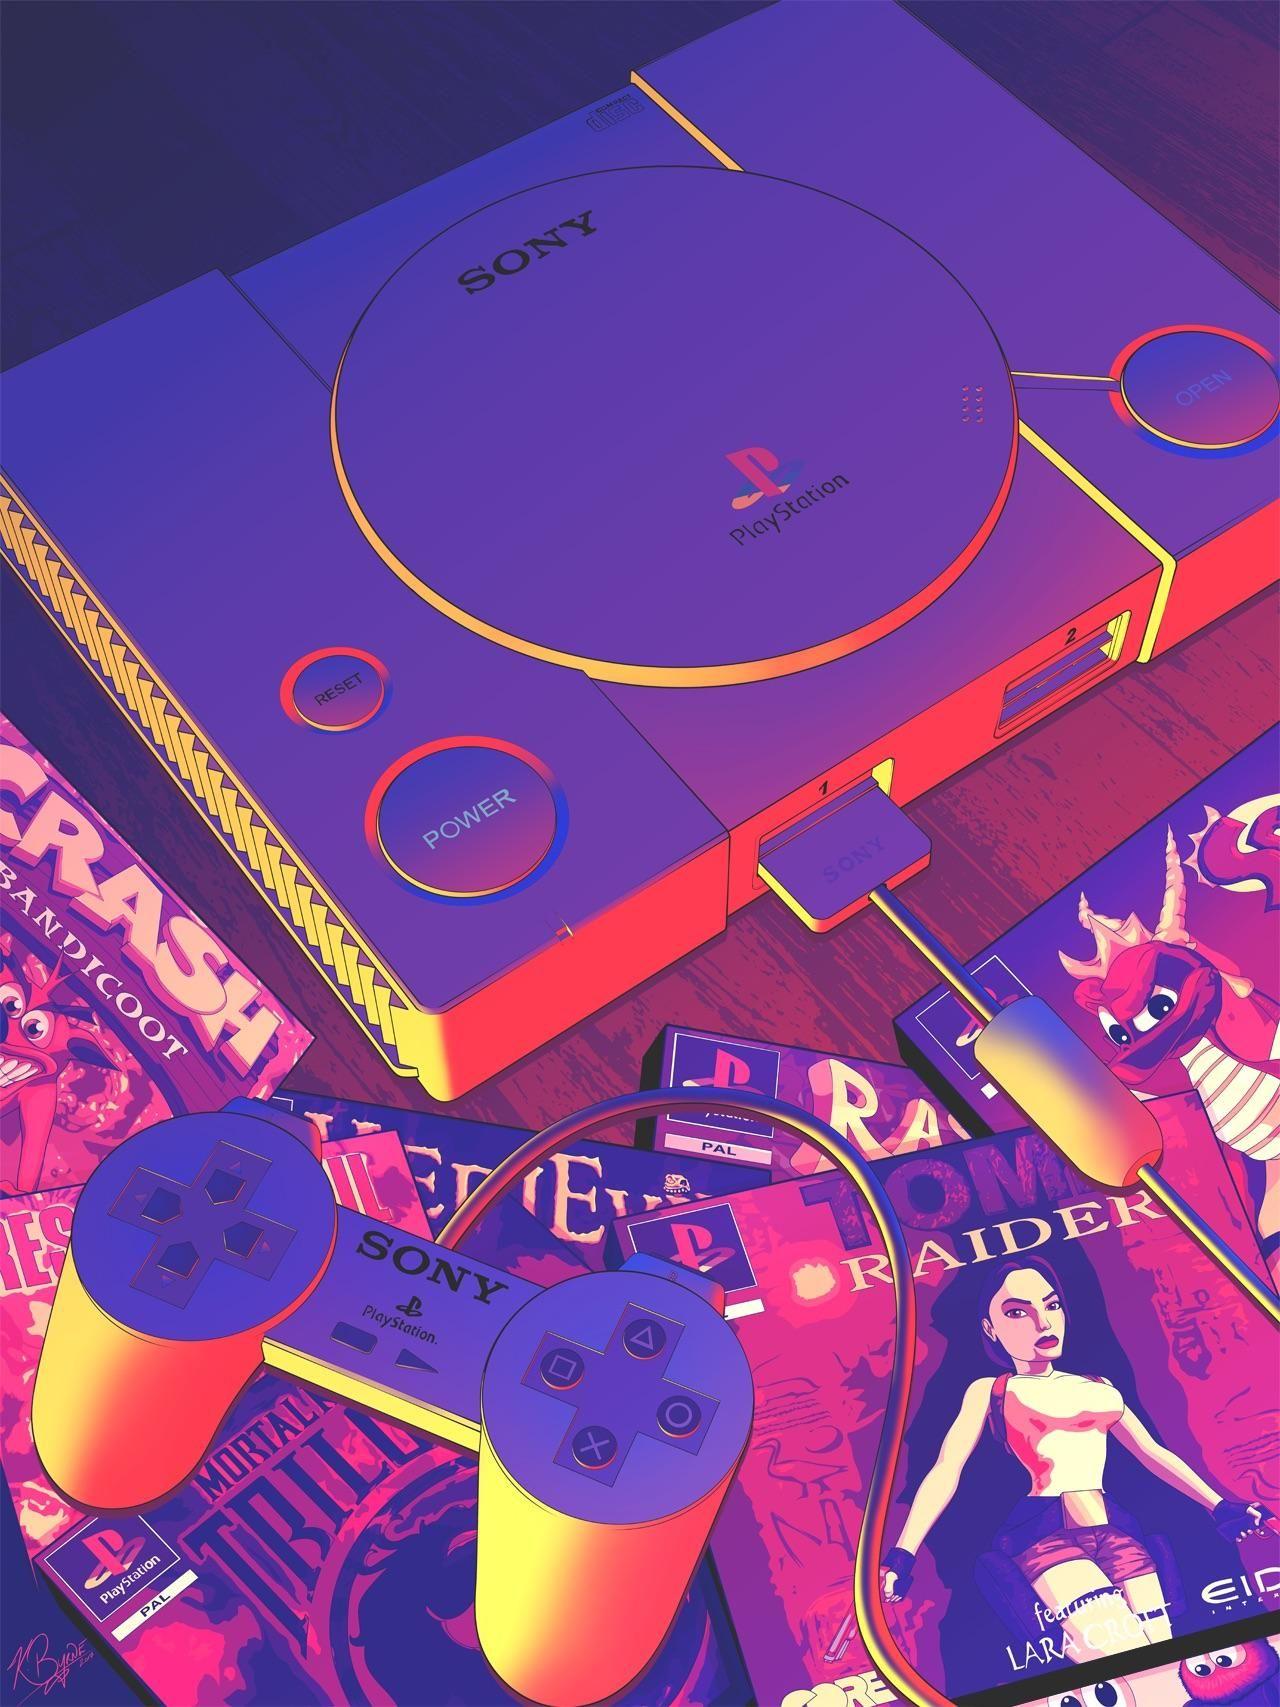 90's Gamer Cyberpunk aesthetic, Aesthetic space, Vaporwave